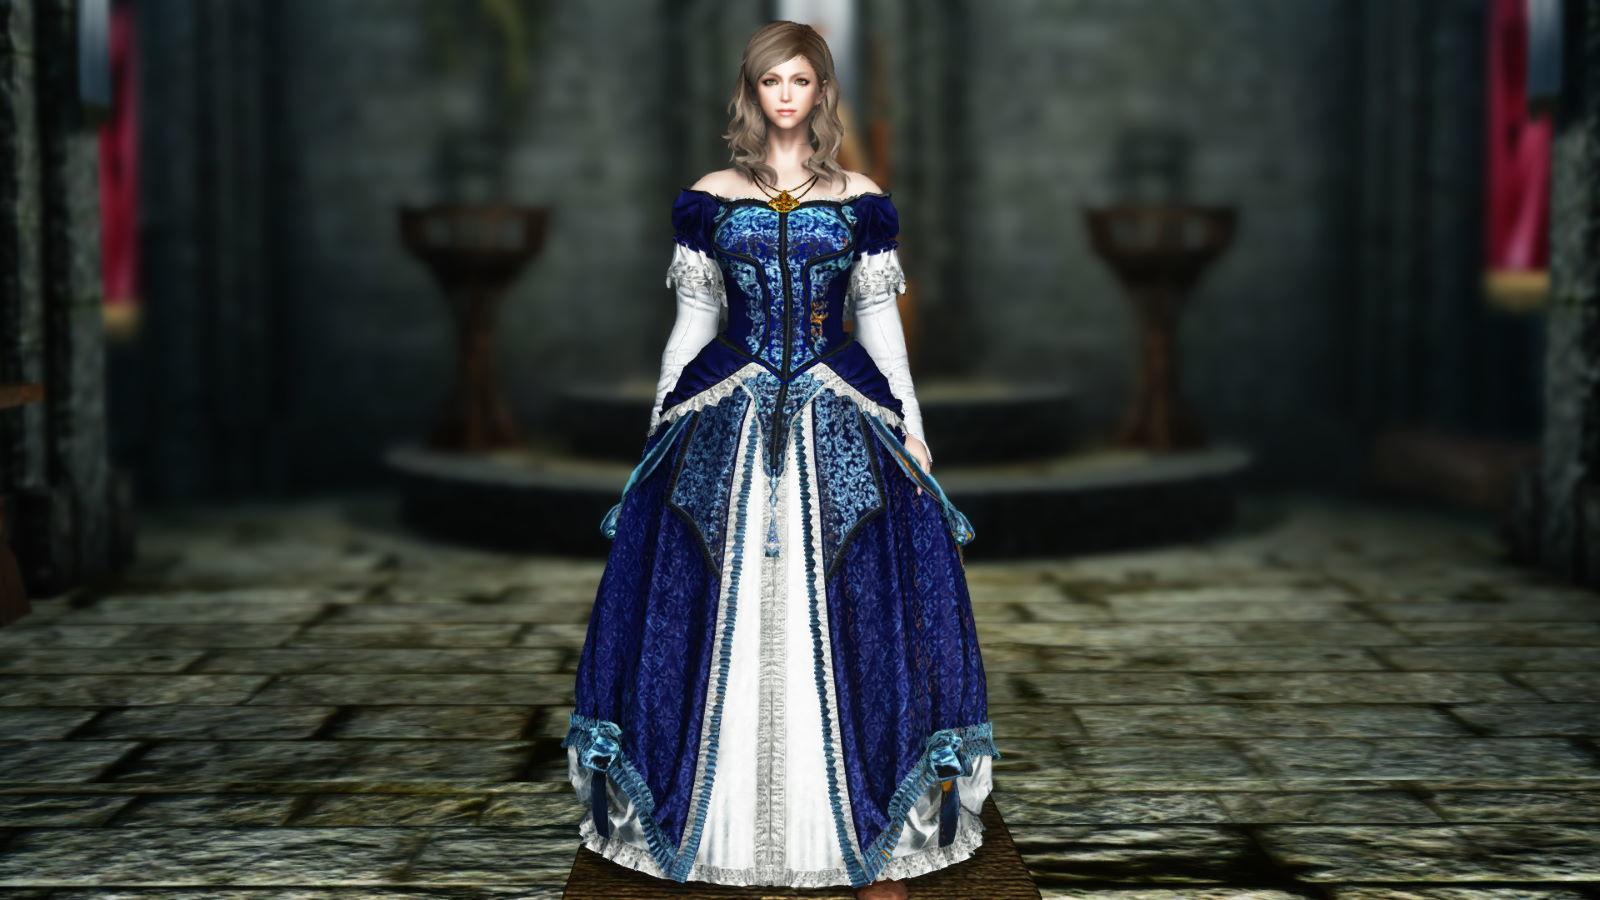 FullInuEliseDressSK 220-1 Pose Dress Blue 1